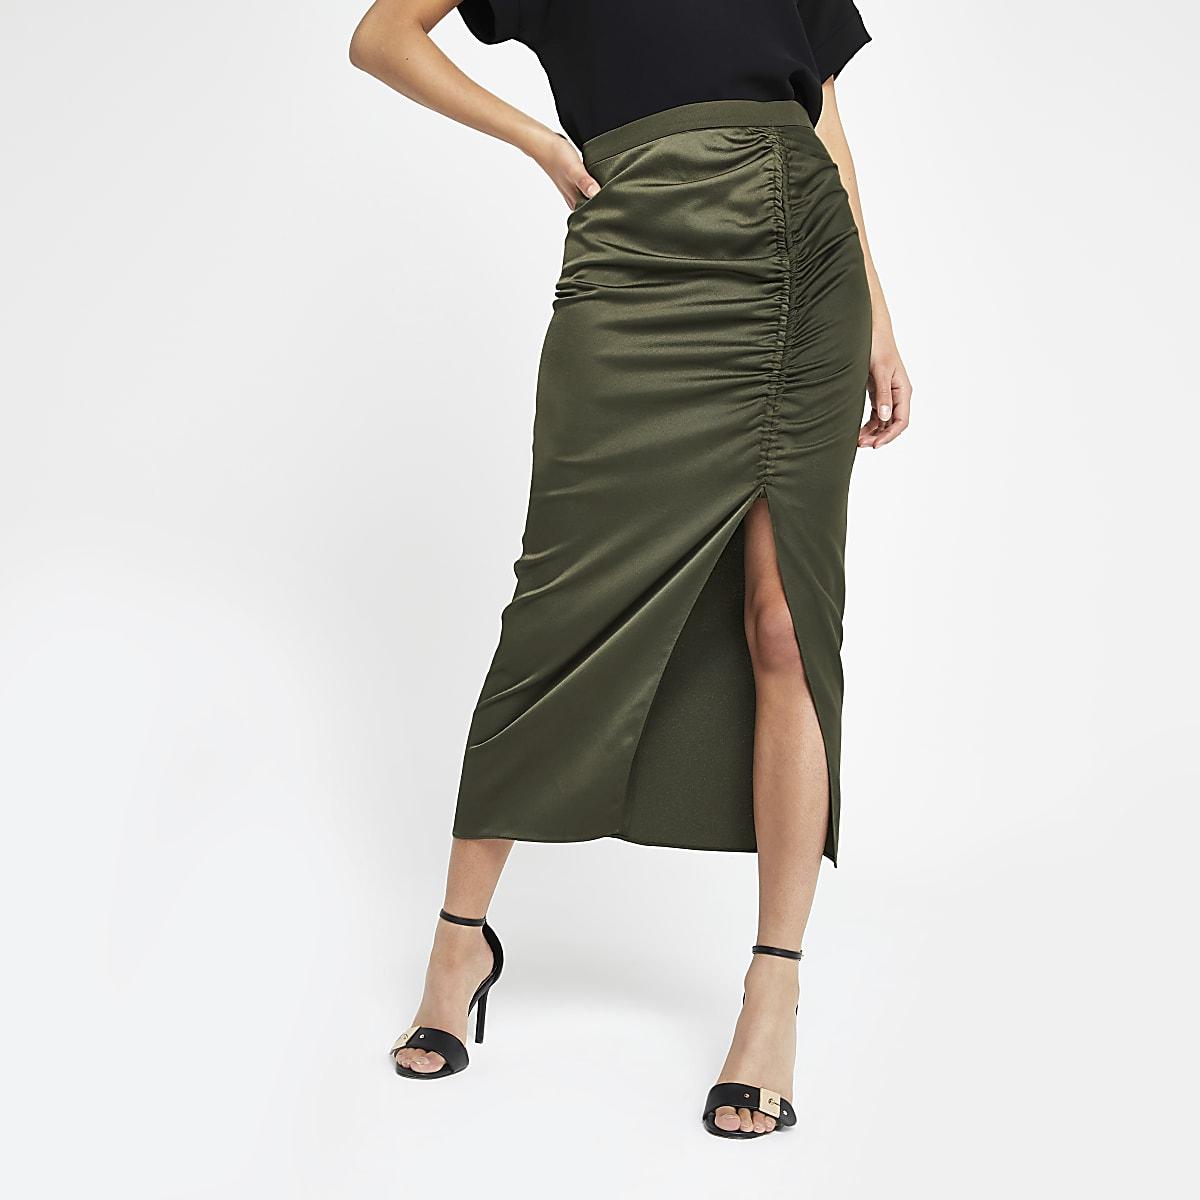 677f7ee36 Khaki ruched side split midi skirt - Midi Skirts - Skirts - women